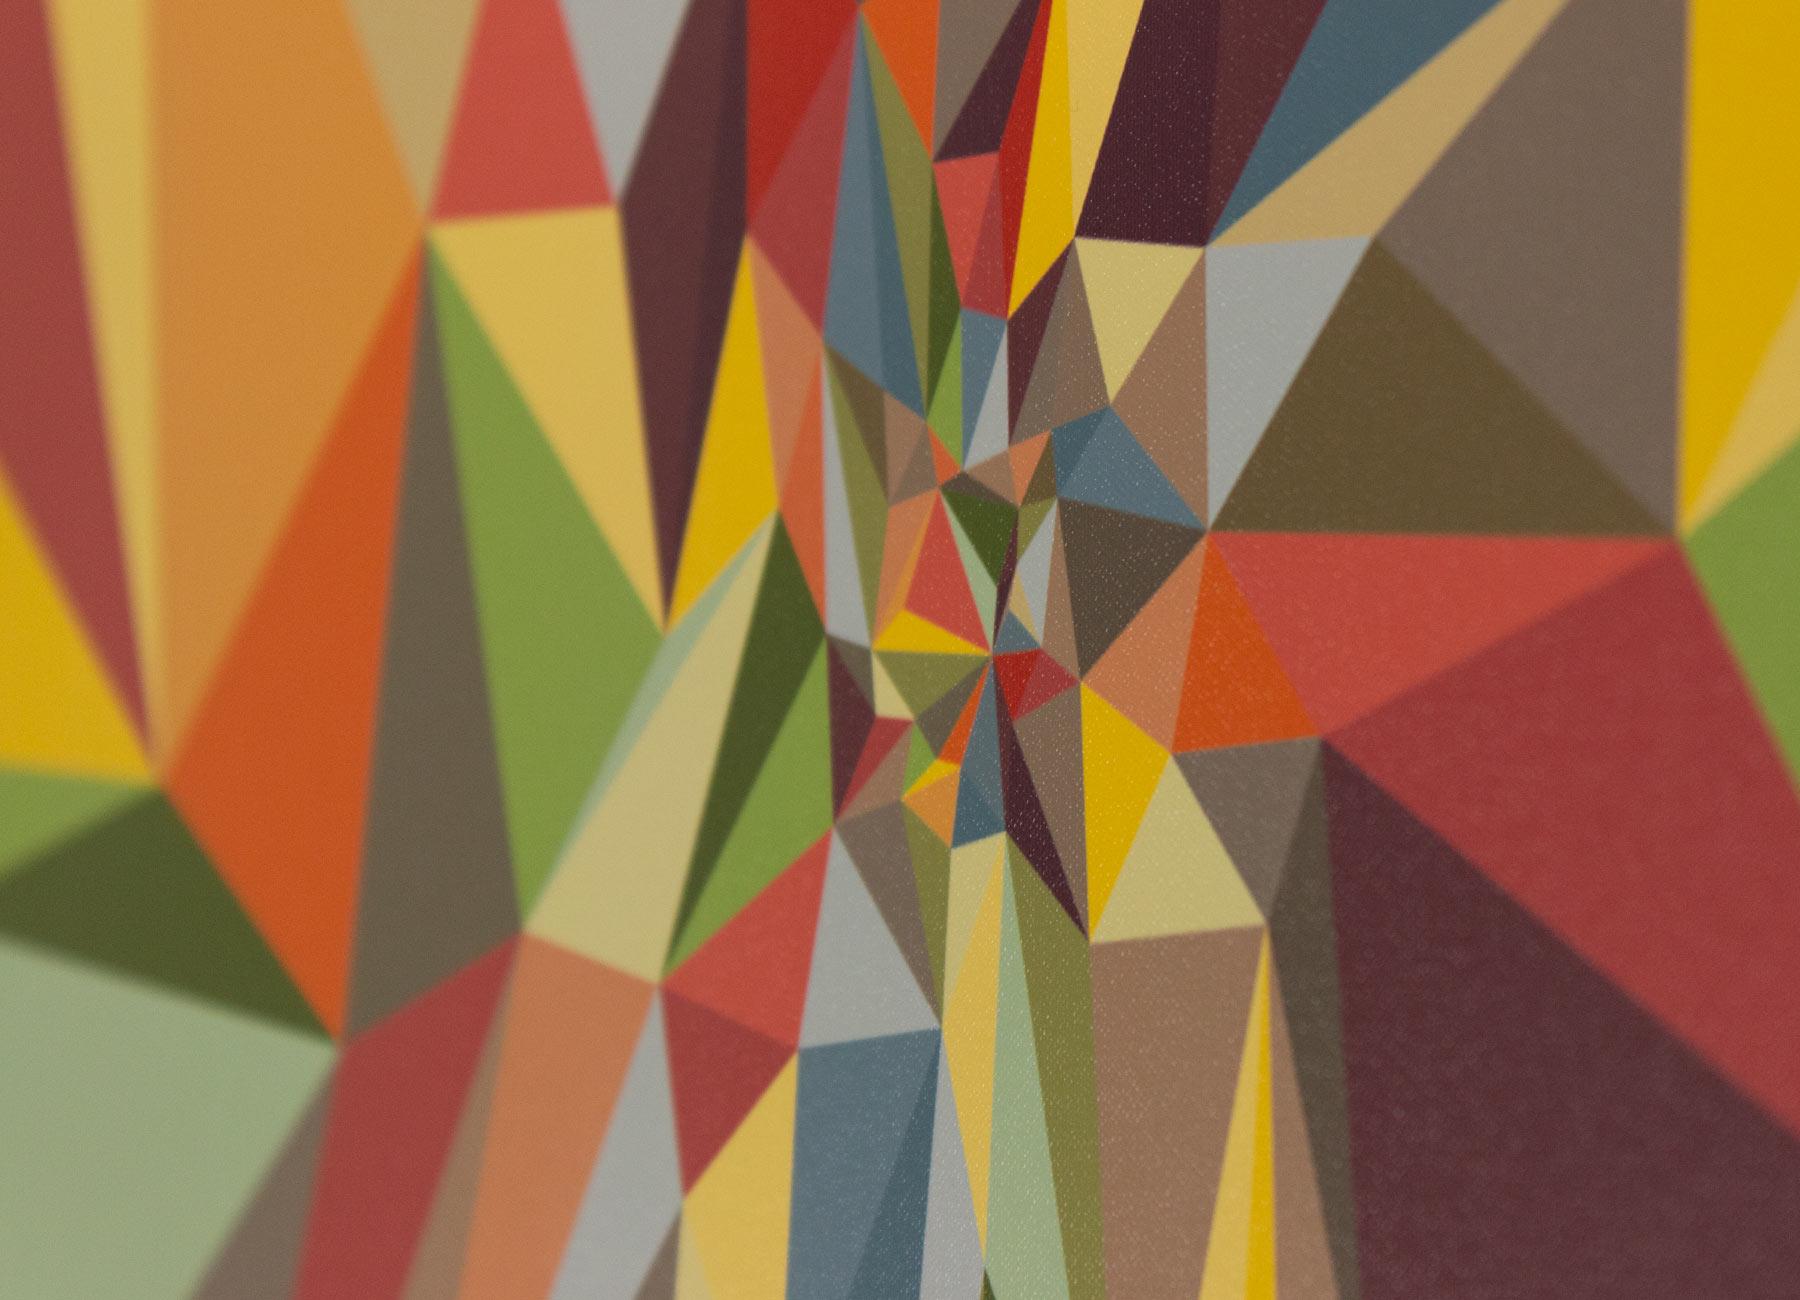 digital print of a colorful geometric pattern